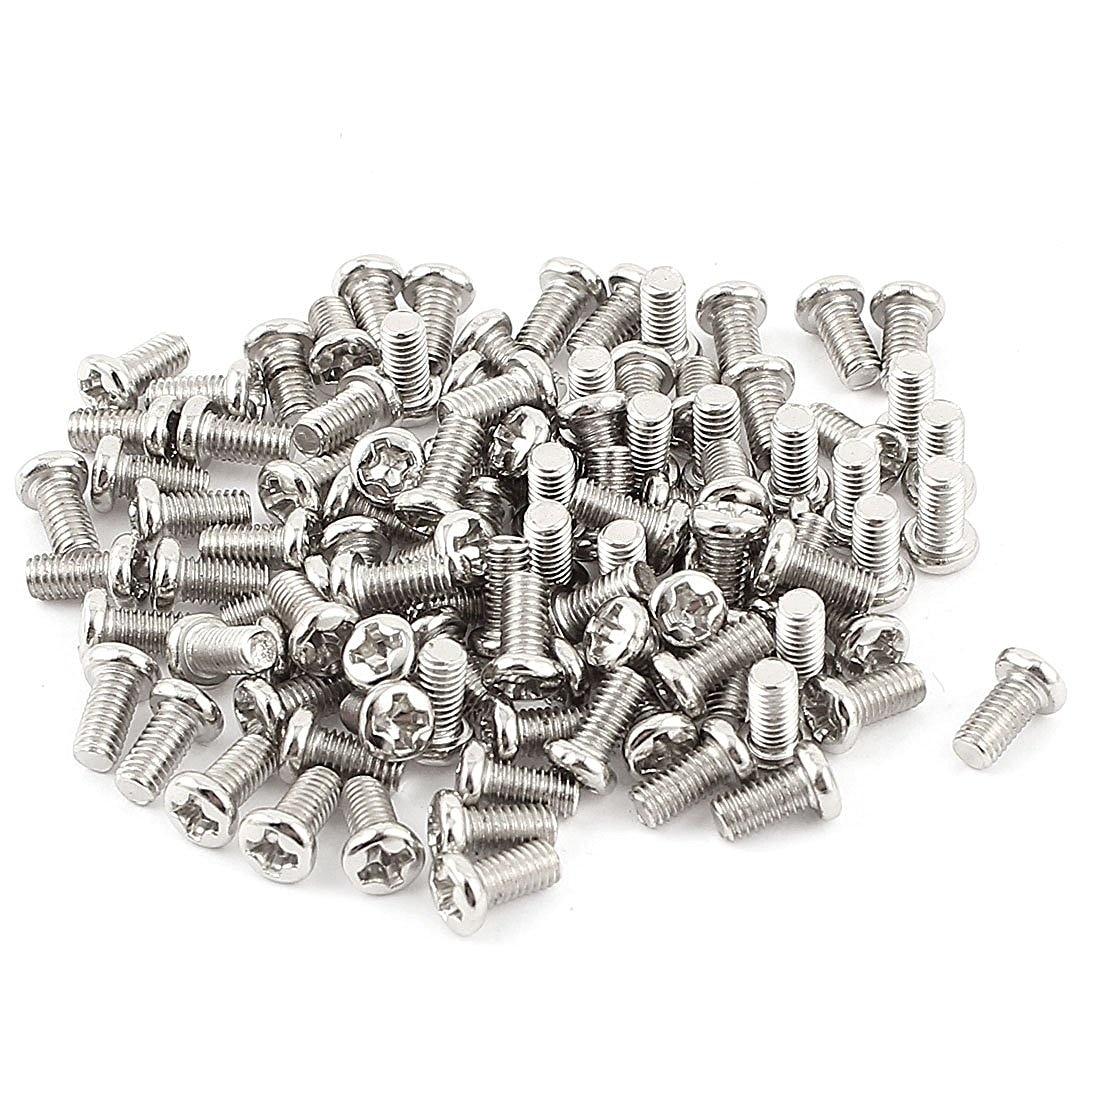 uxcell M4x10mm Machine Screws Pan Phillips Cross Head Screw 304 Stainless Steel Fasteners Bolts 60Pcs